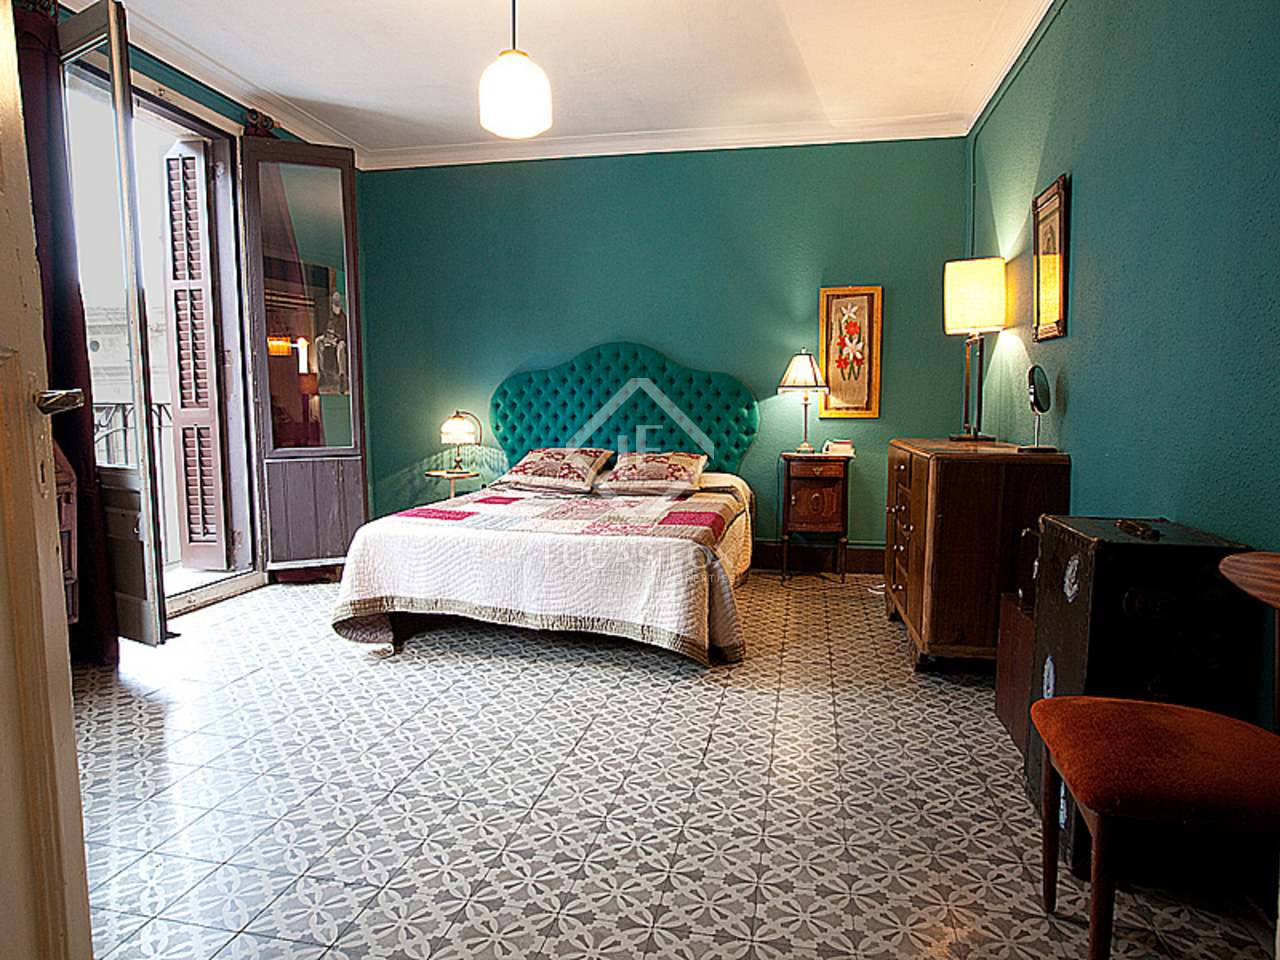 Appartement historique unique vendre ciutat vella barcelone - Acheter appartement a barcelone ...